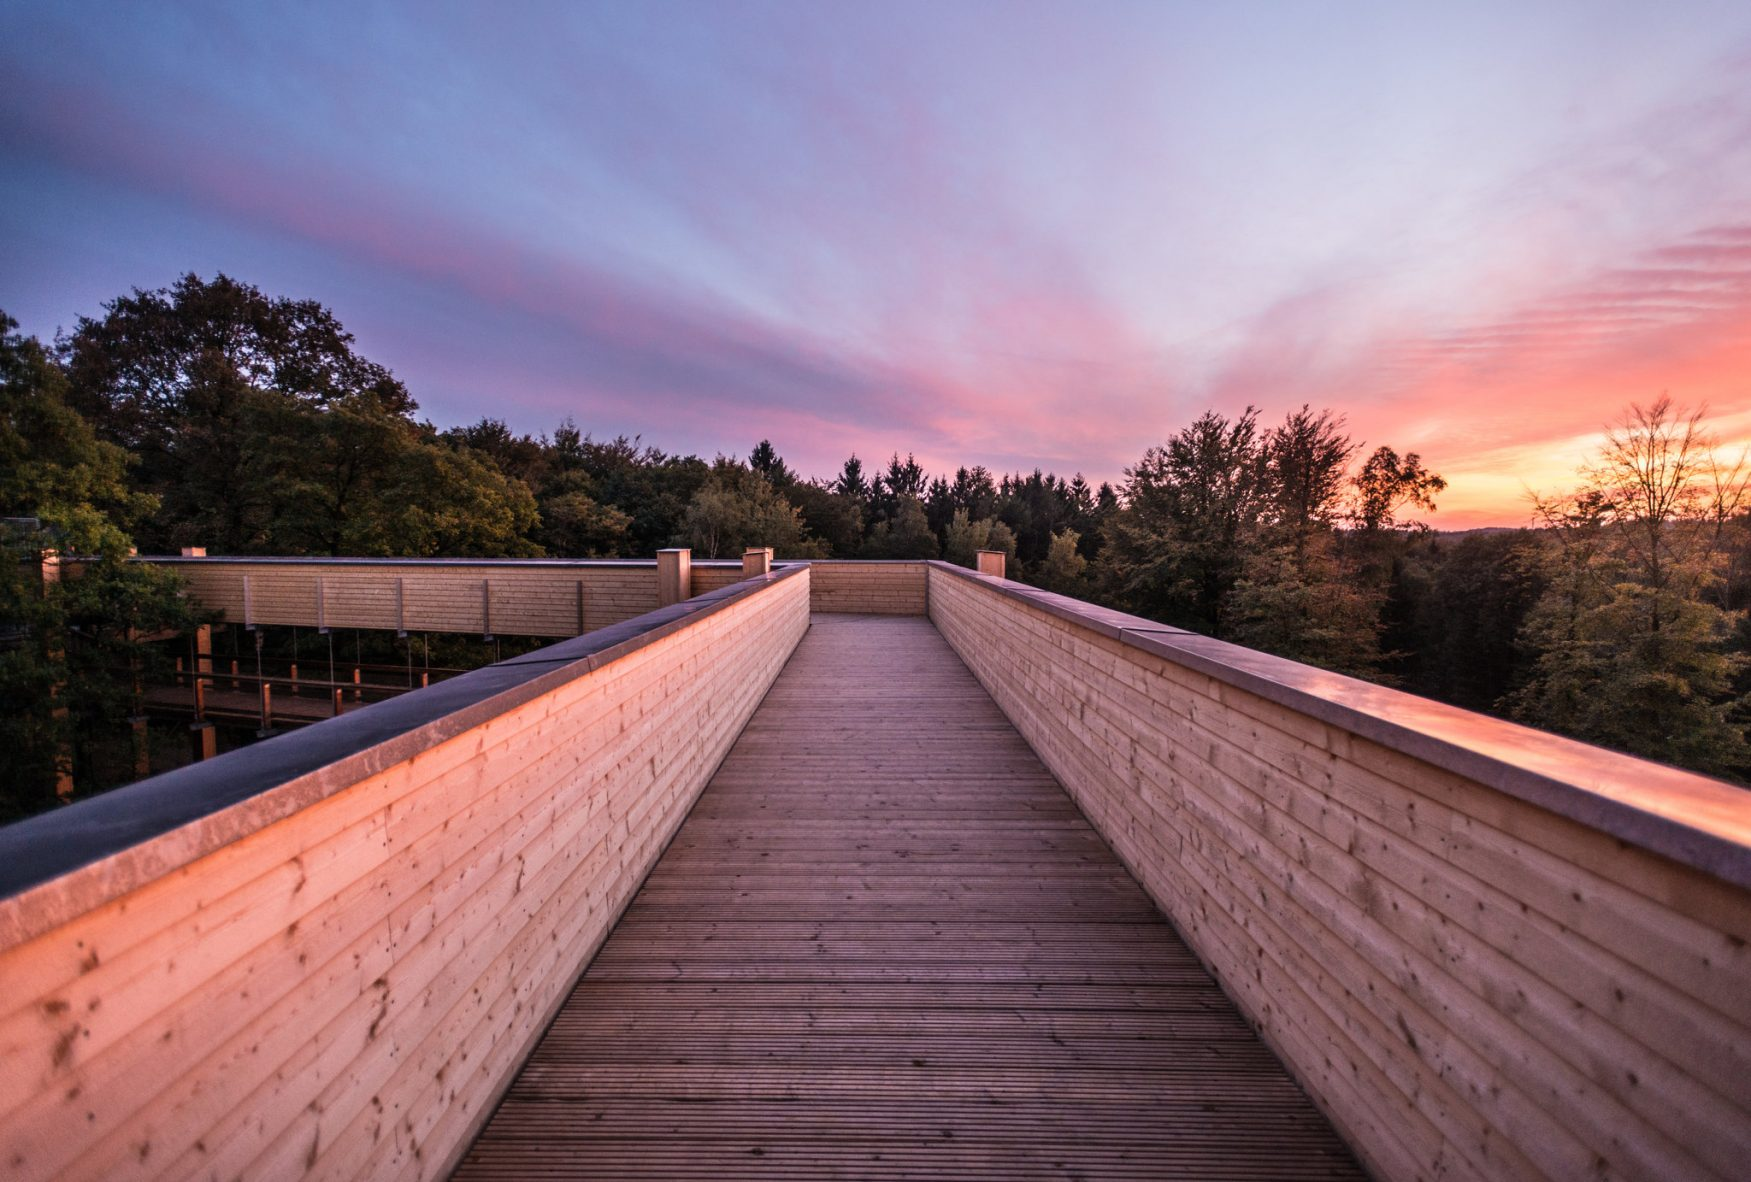 Blick auf panarbora Waldbroel Foto: Dominik Ketz